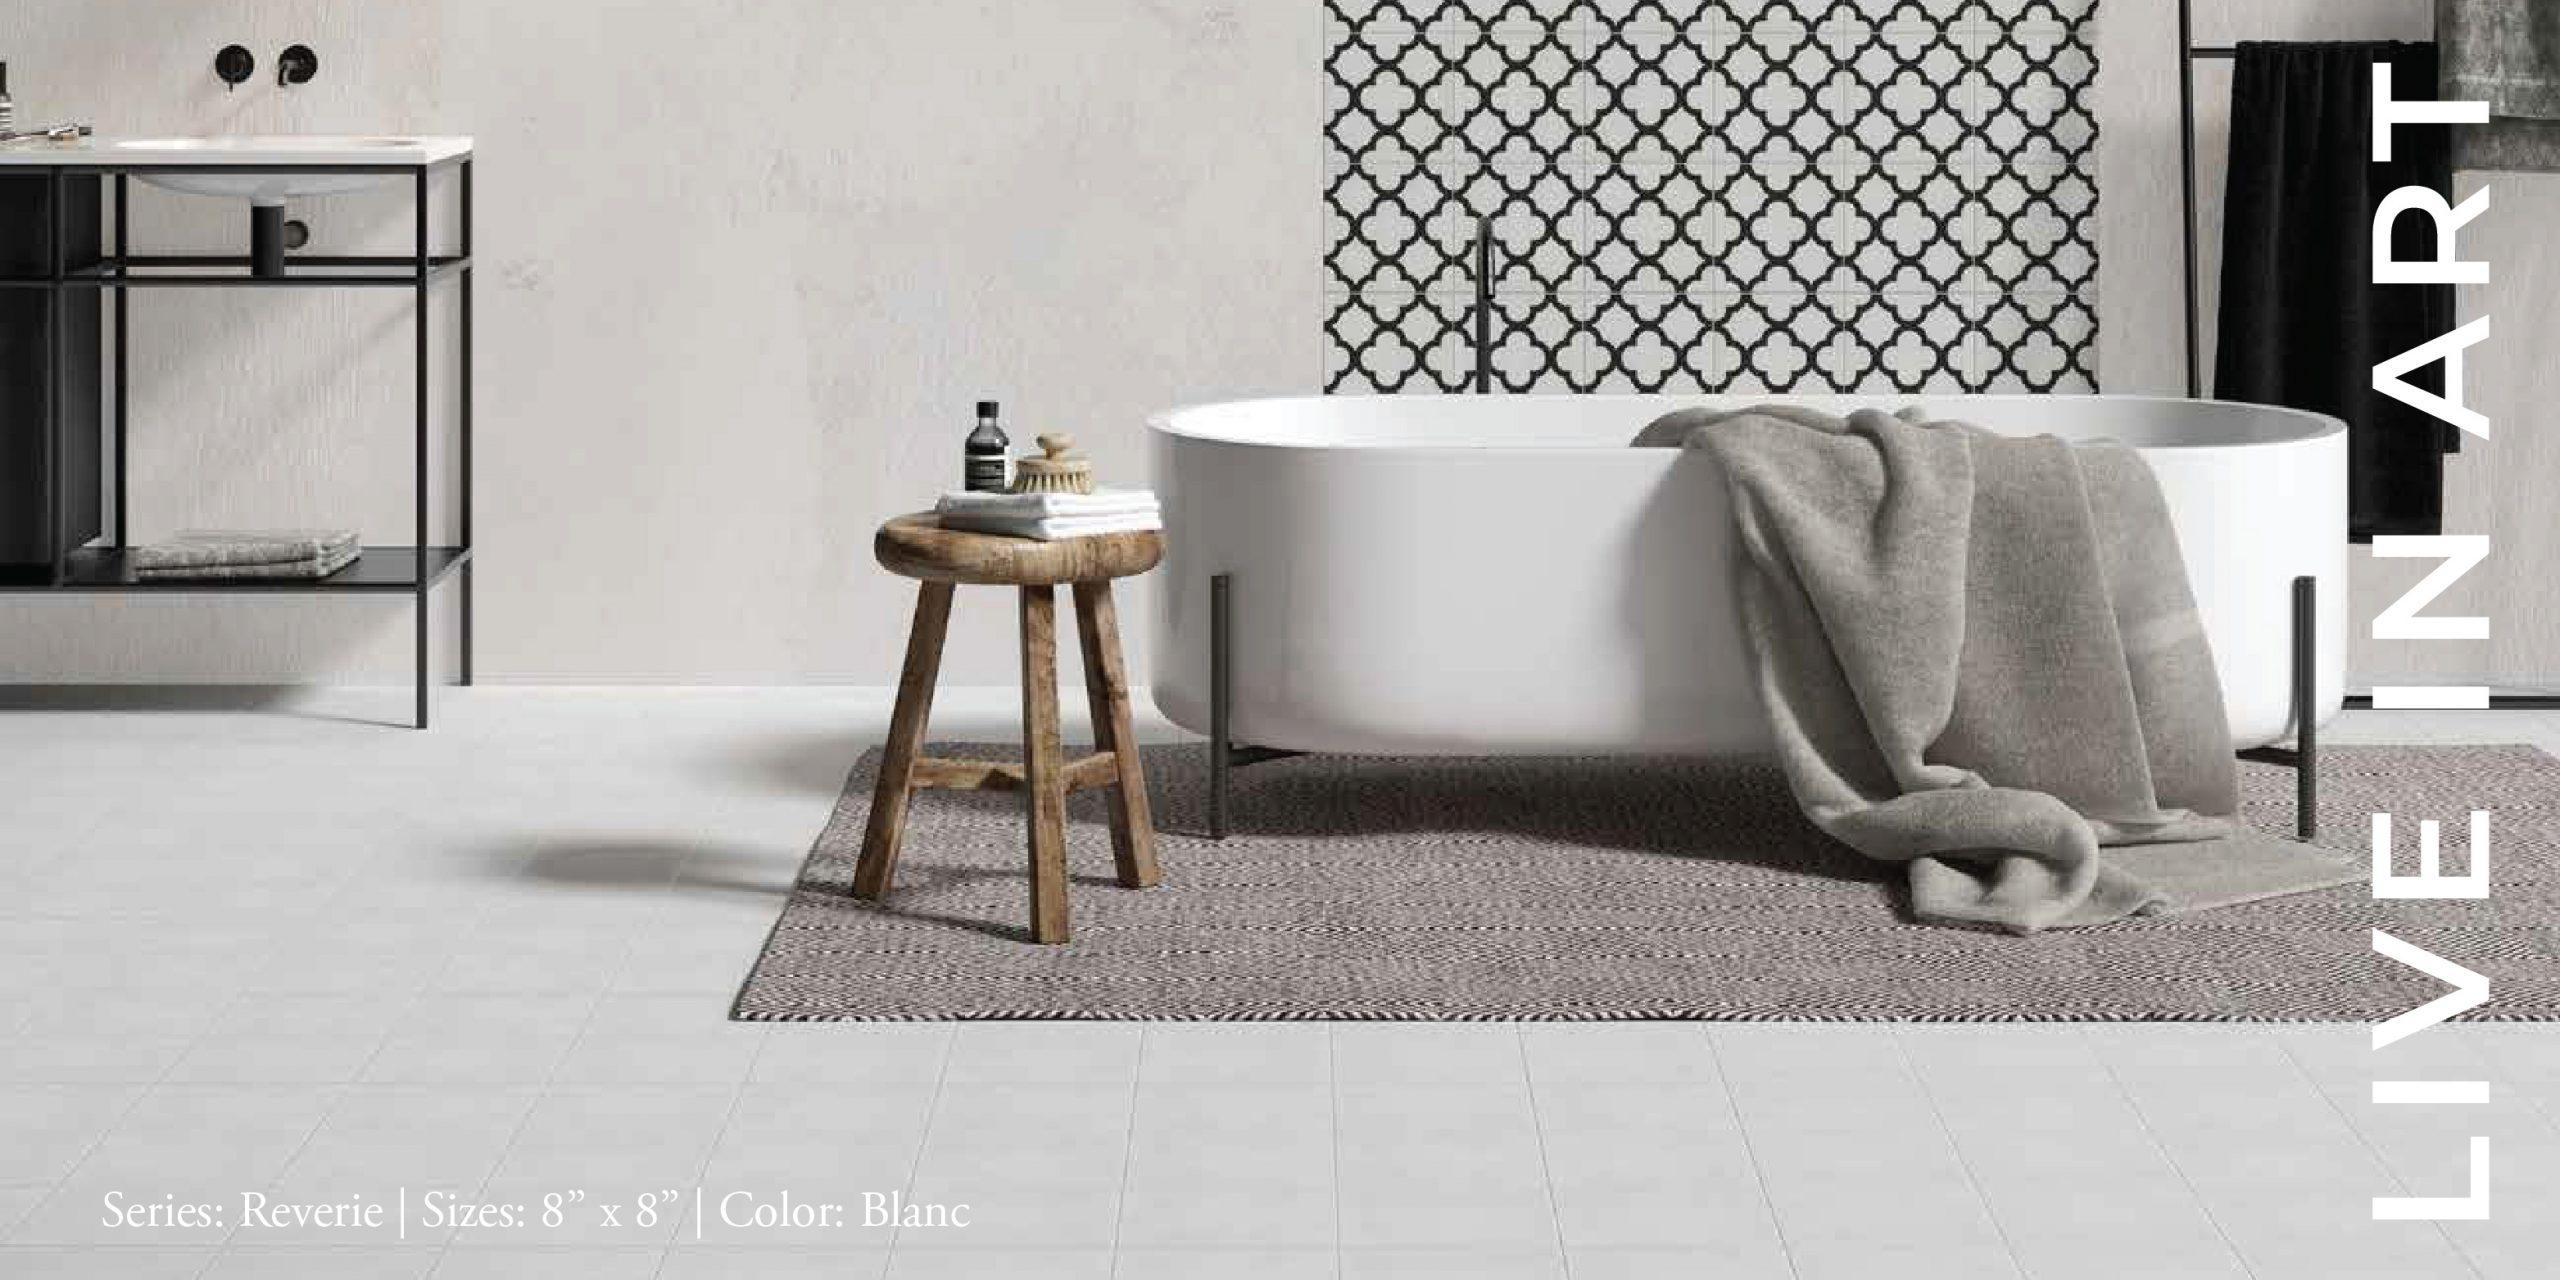 Reverie Blanc 8x8